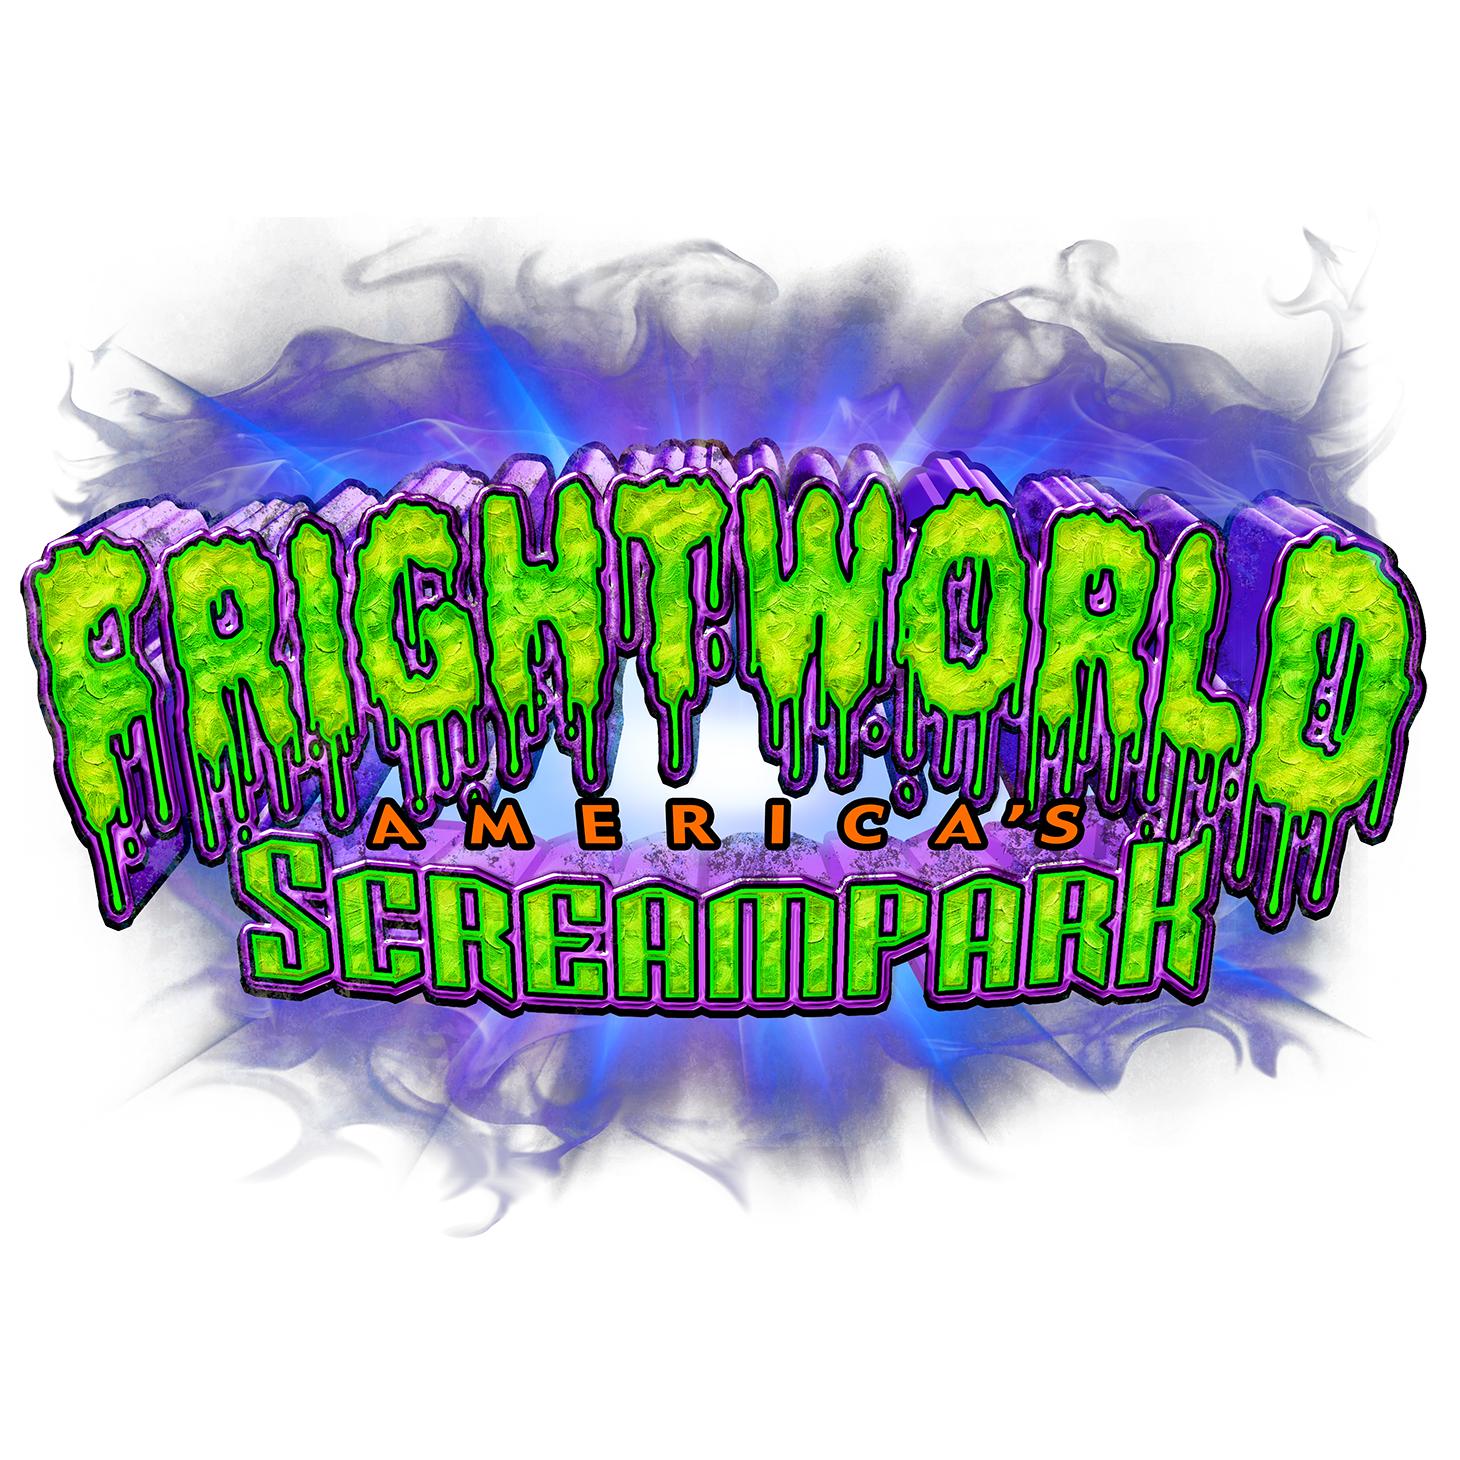 Frightworld, America's Screampark - Amherst, NY 14228 - (716)404-9604 | ShowMeLocal.com